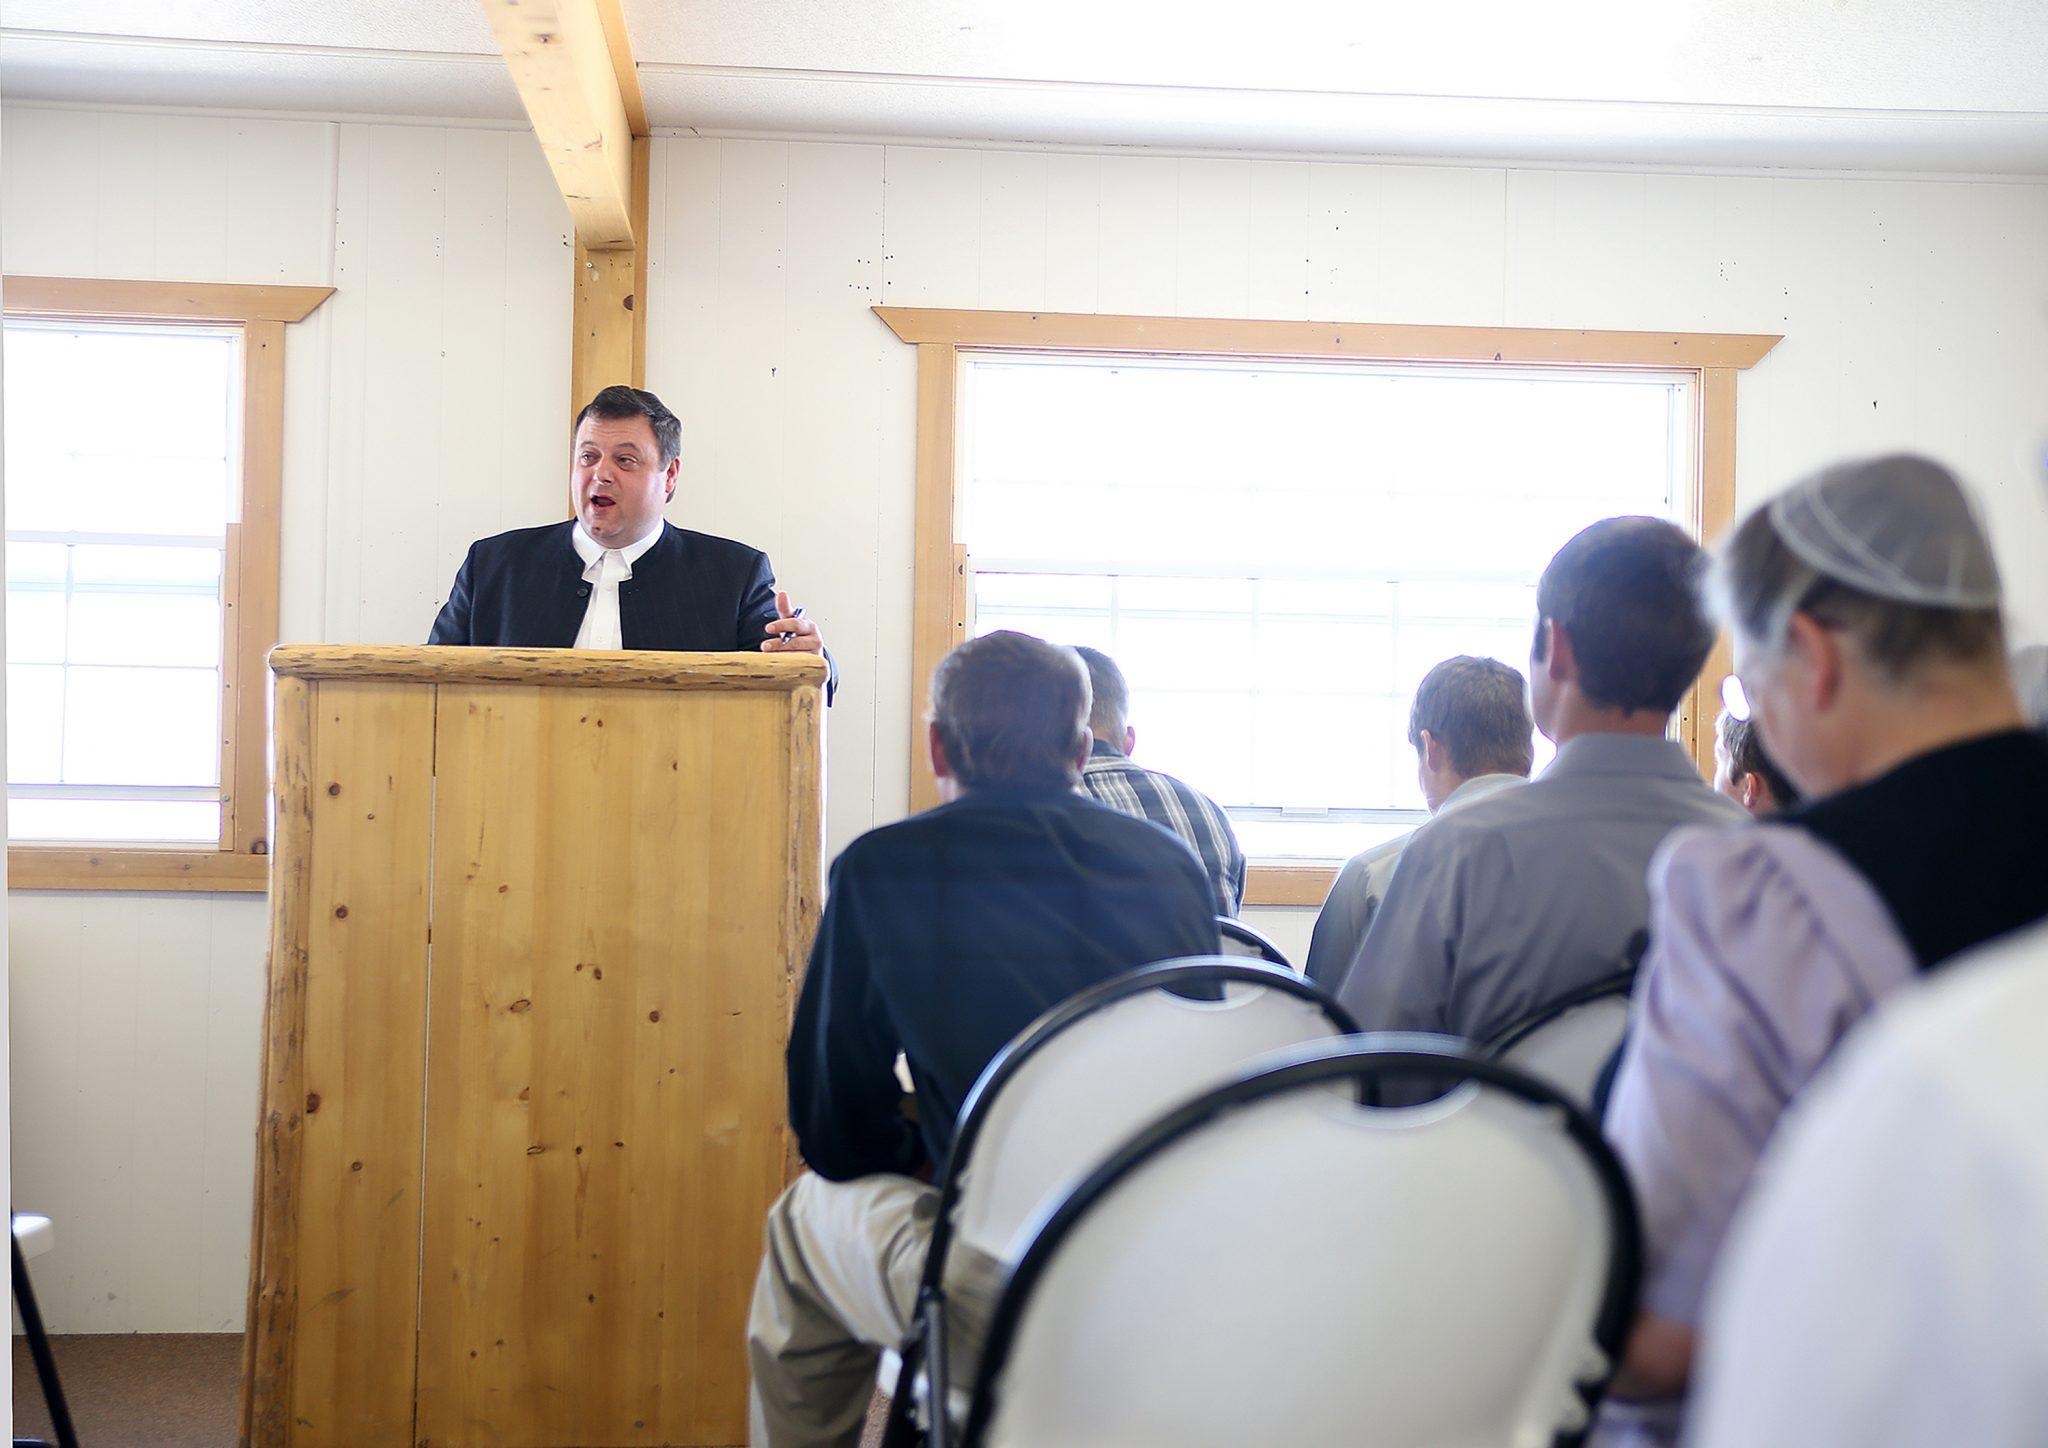 Mennonites presence dates back to 1990s in Eureka County